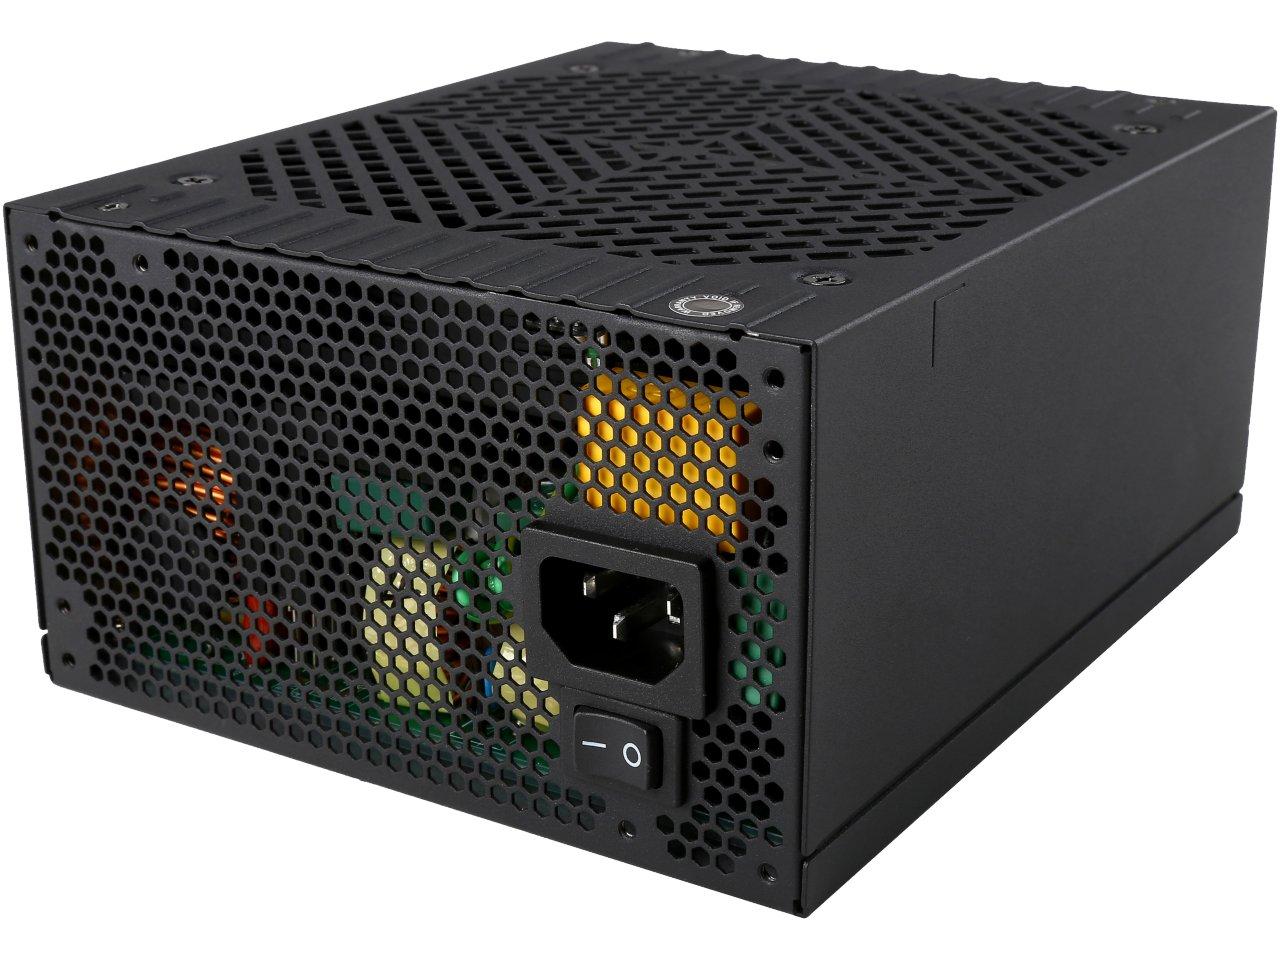 850 Watt Rosewill Capstone-G850 80 Plus Gold Certified Semi-Modular Power Supply for $64.99 AR + Free Shipping @ Newegg.com